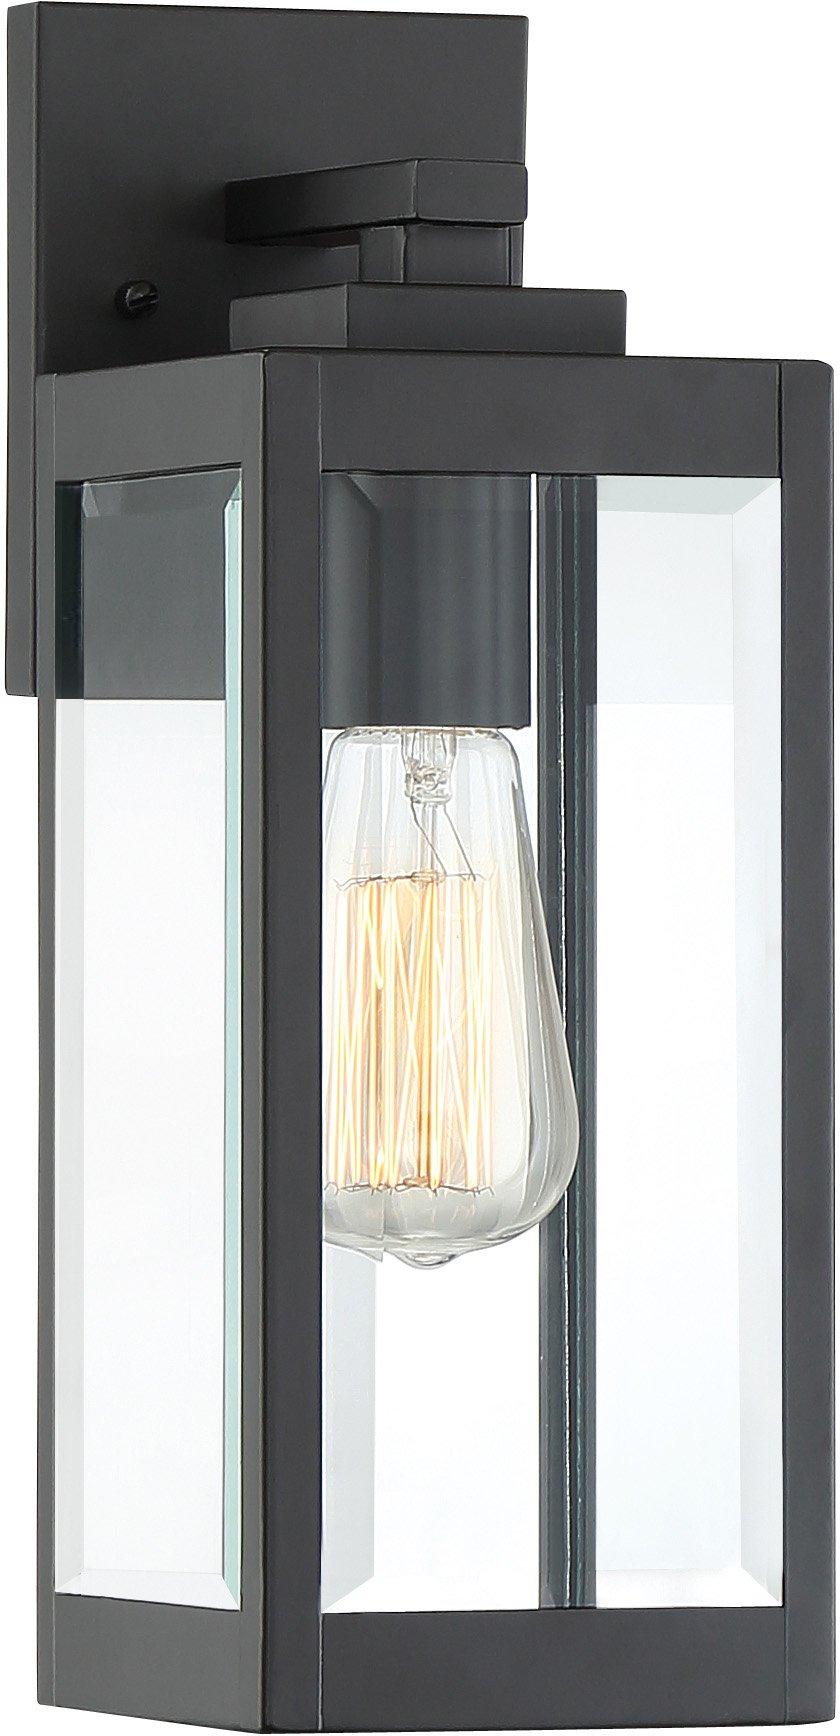 Quoizel WVR8405EK Westover Modern Industrial Outdoor Wall Sconce Lighting, 1-Light, 100 Watt, Earth Black (14''H x 5''W)